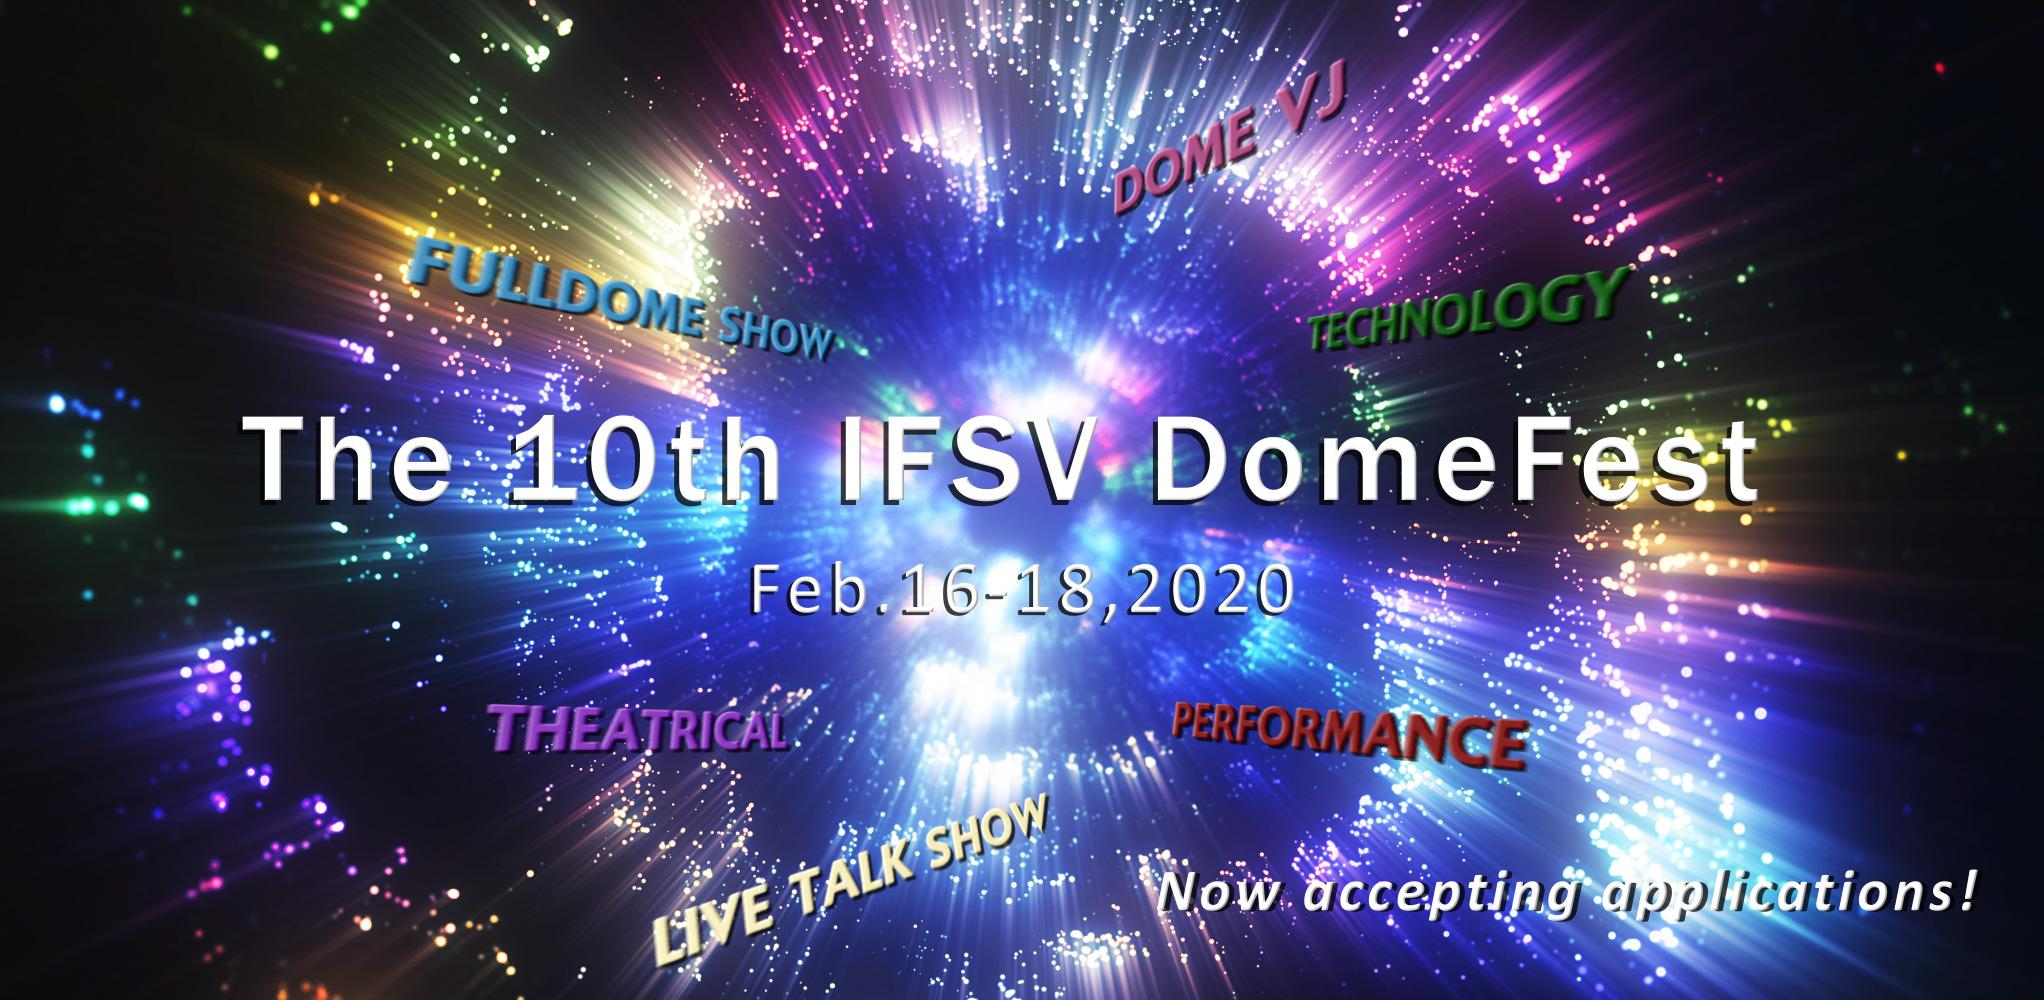 img news fulldome The 10th IFSV DomeFest(Tokyo) [[ Feb16-18, 2020 ]]